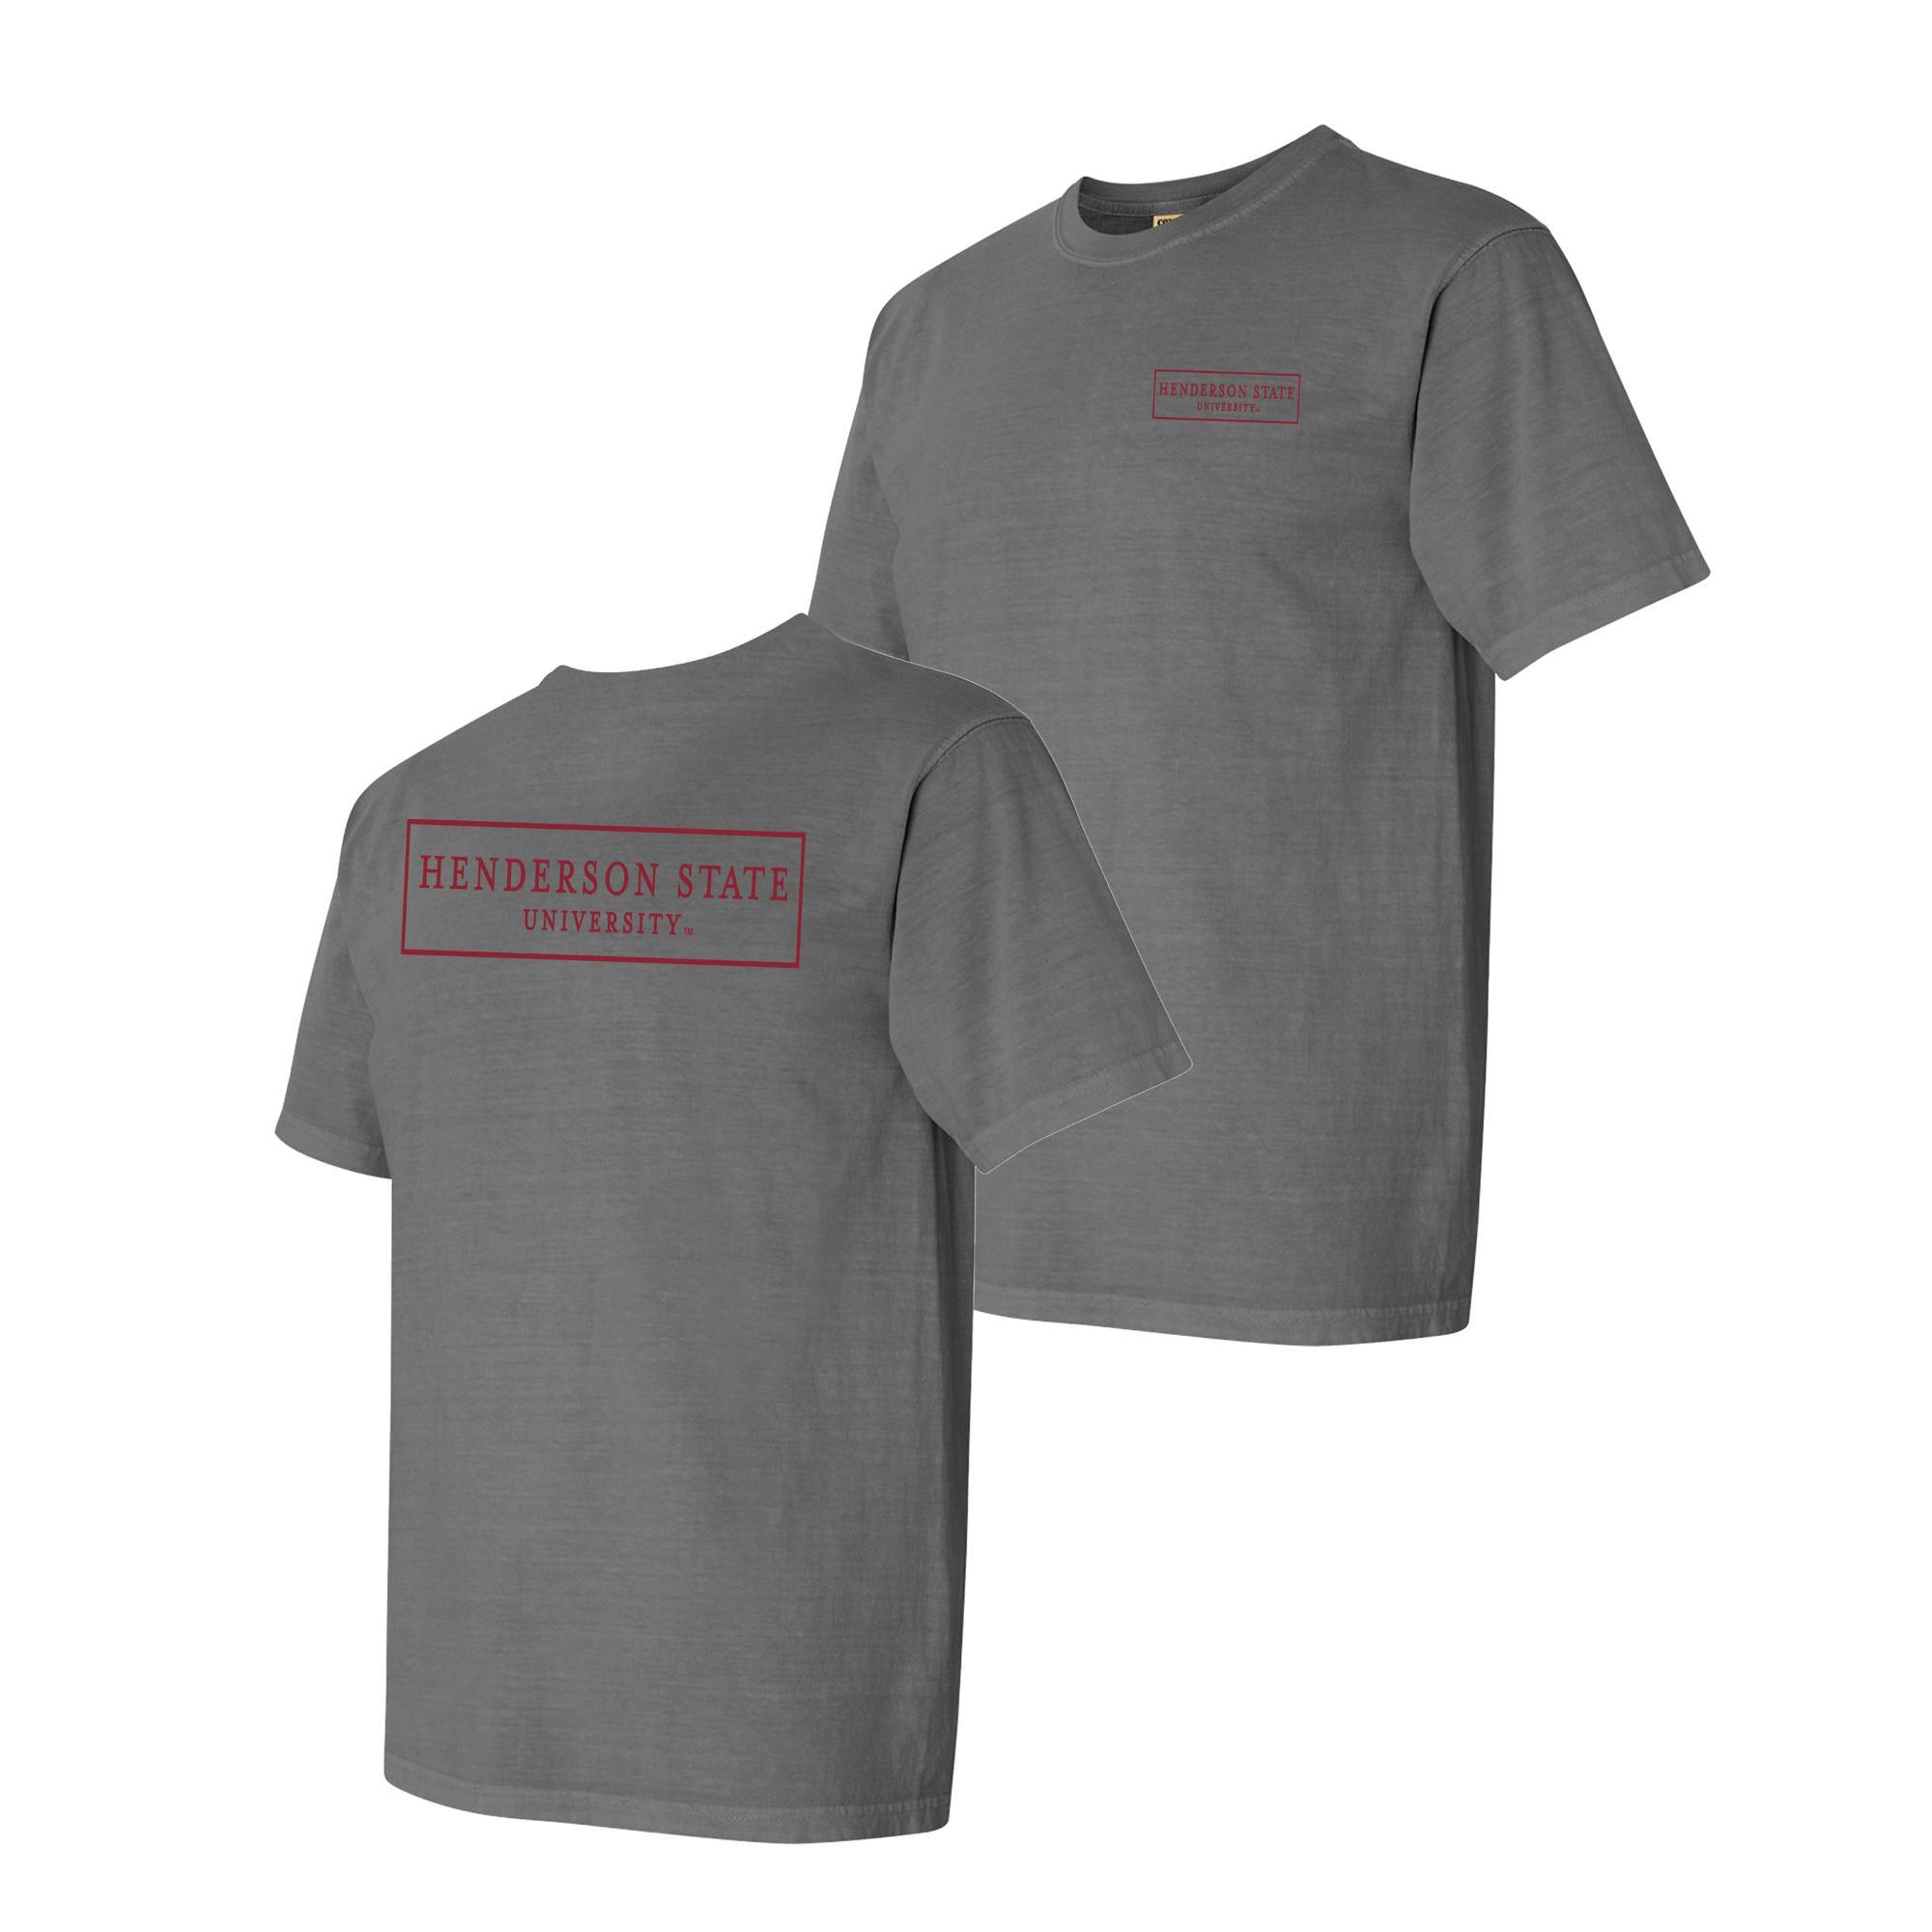 image of: Henderson State University Comfort Colors Short Sleeve T-Shirt